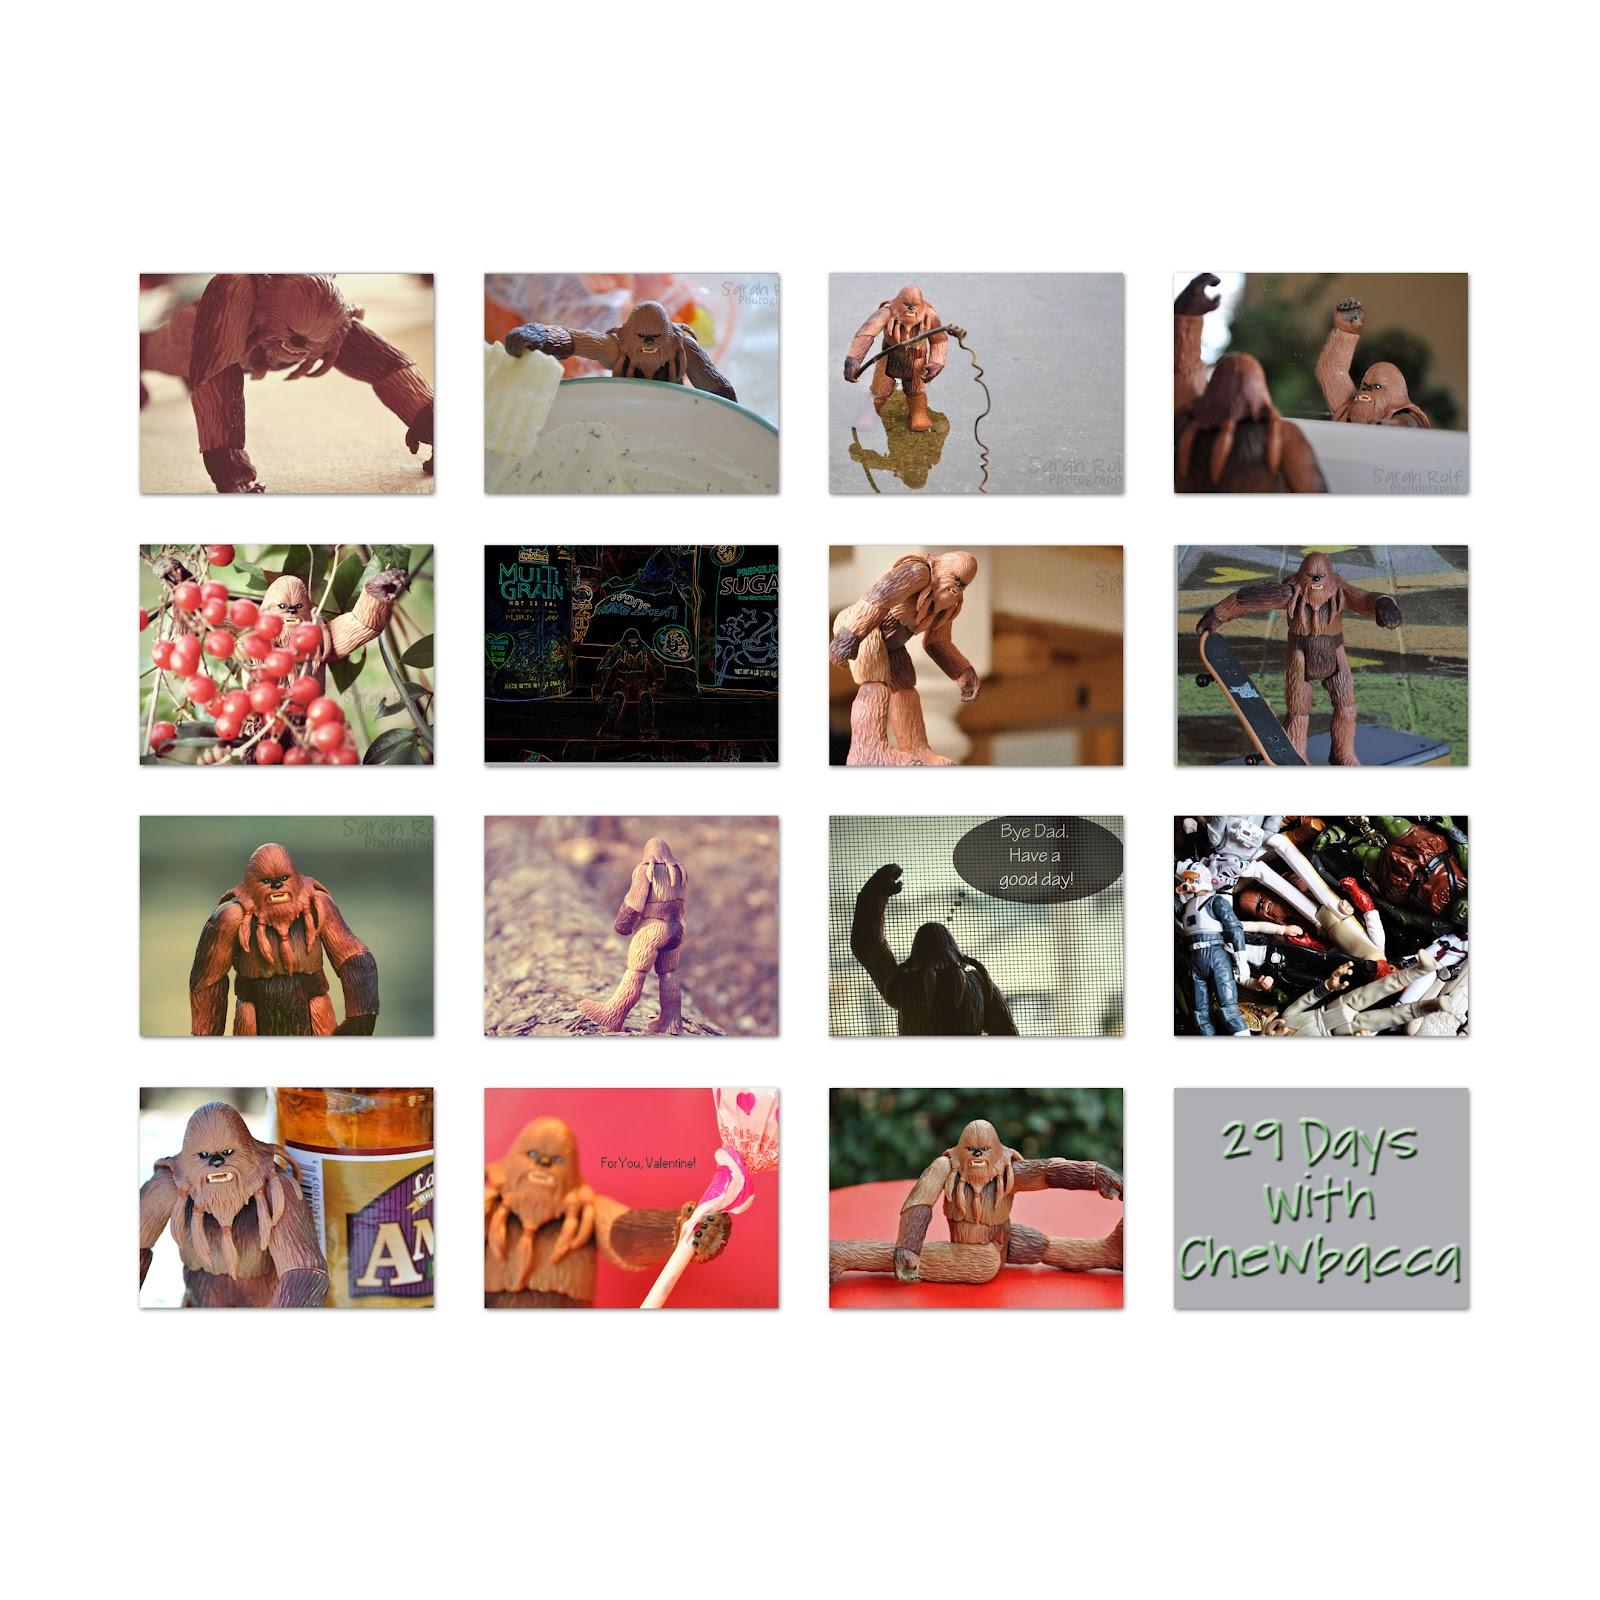 http://4.bp.blogspot.com/-62PmsgJPmYc/Tz_Ew55m0tI/AAAAAAAAFYY/WjAkekDaVHA/s1600/Chewbacca-collage-1.jpg